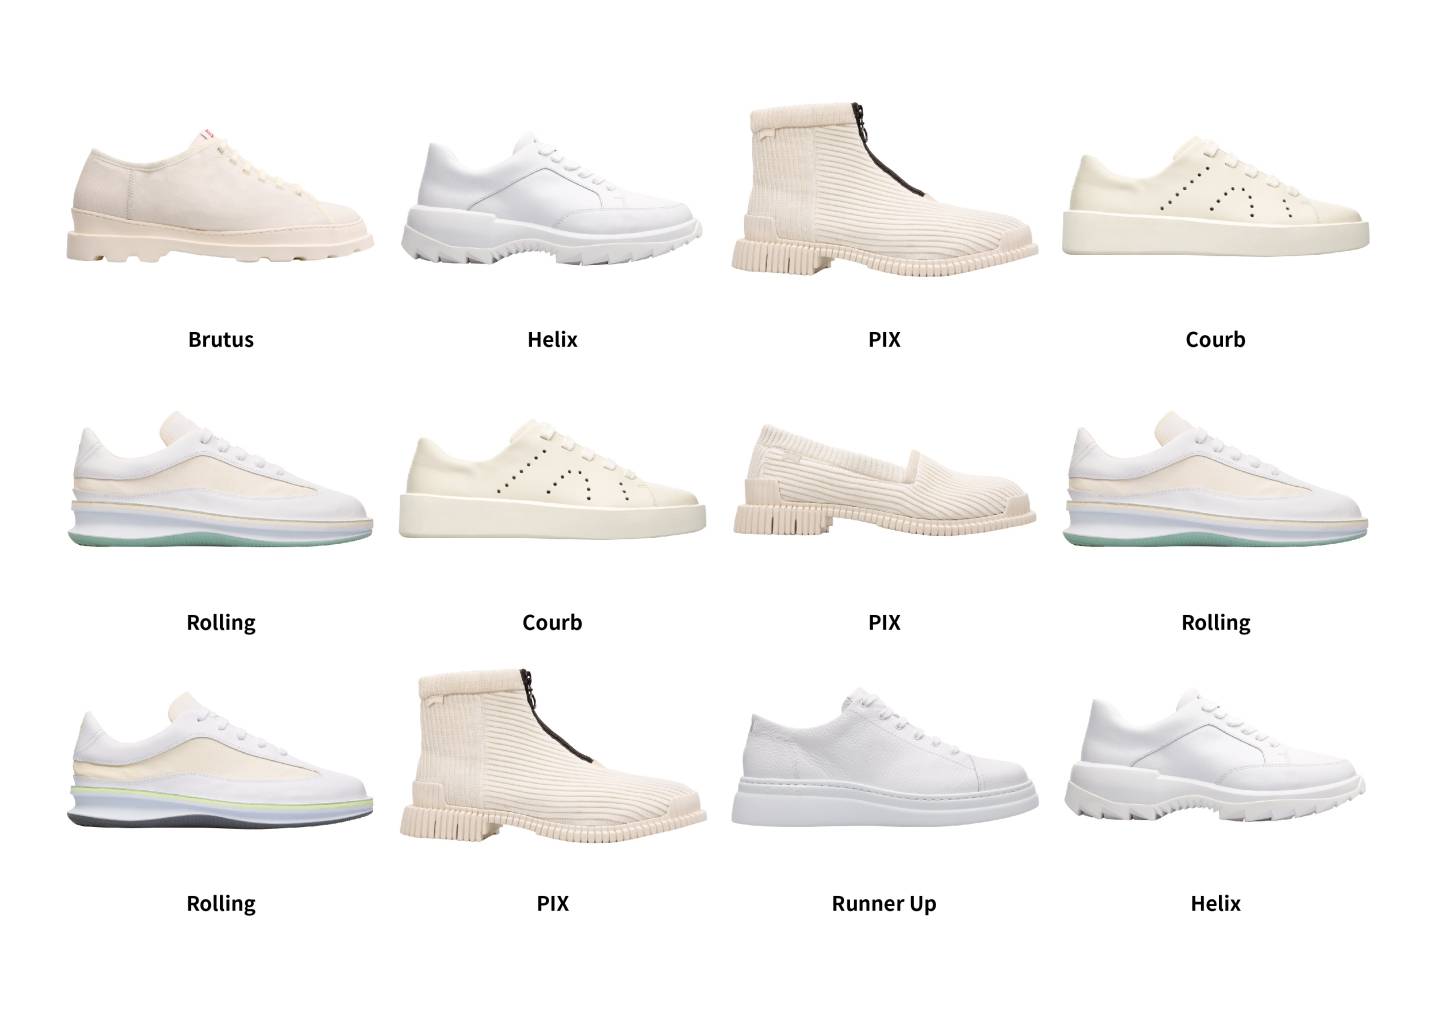 「camper Timelessness 台灣青年創作展」,來自熱情陽光的西班牙camper城市休閒鞋與台灣藝術家合作,邀請12組不同領域的創作者參與camper 2019春夏白鞋創作。